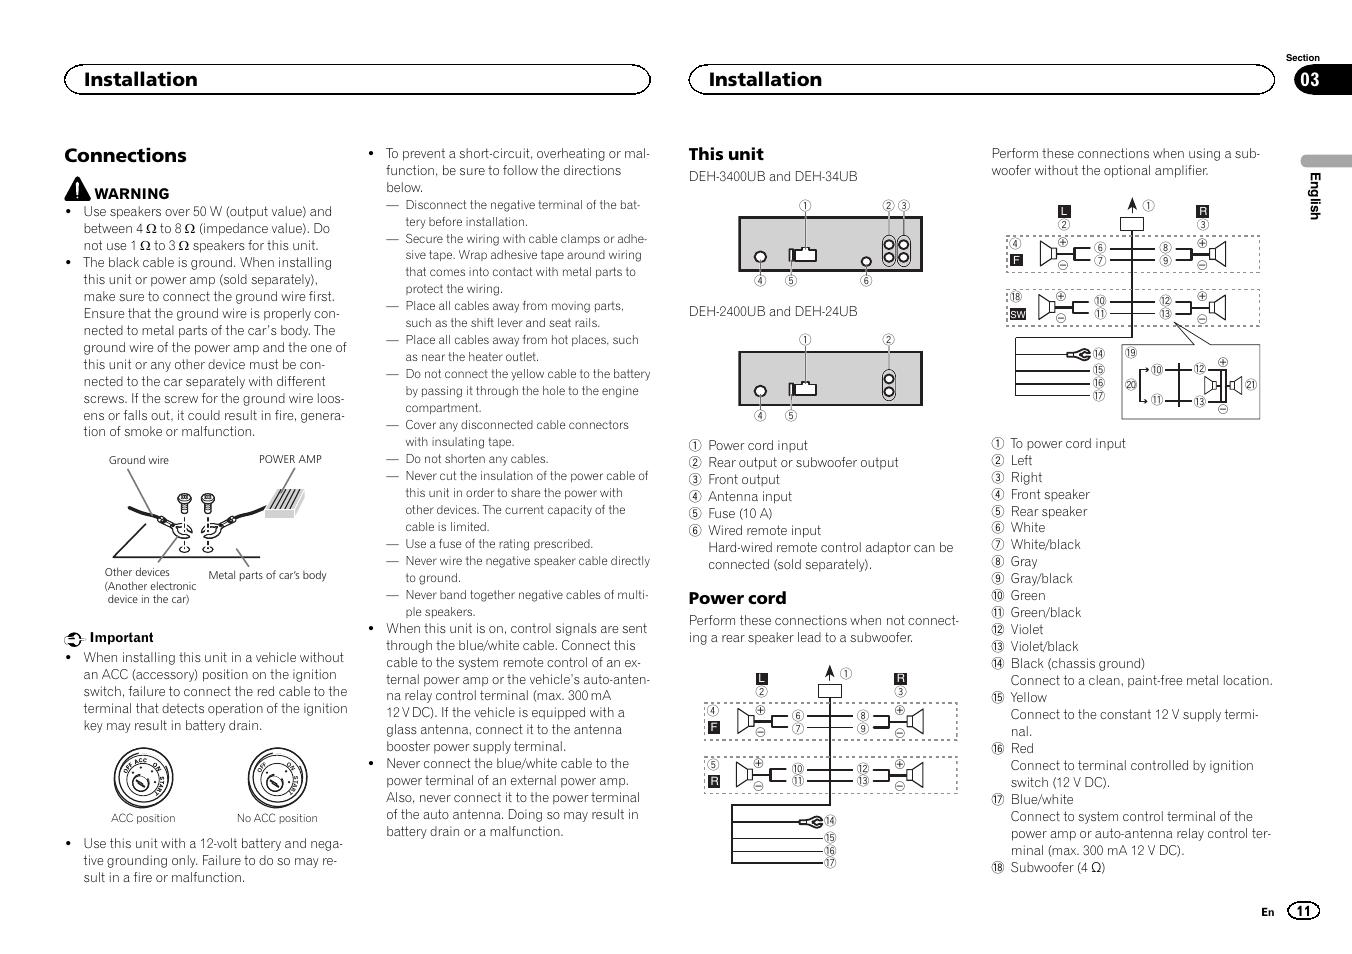 Schematic X5500hd Wiring Pioneer Deh on pioneer deh-1300mp wiring diagram, pioneer deh-73bt wiring diagram, pioneer deh-23ub wiring diagram, pioneer deh-64bt wiring diagram,